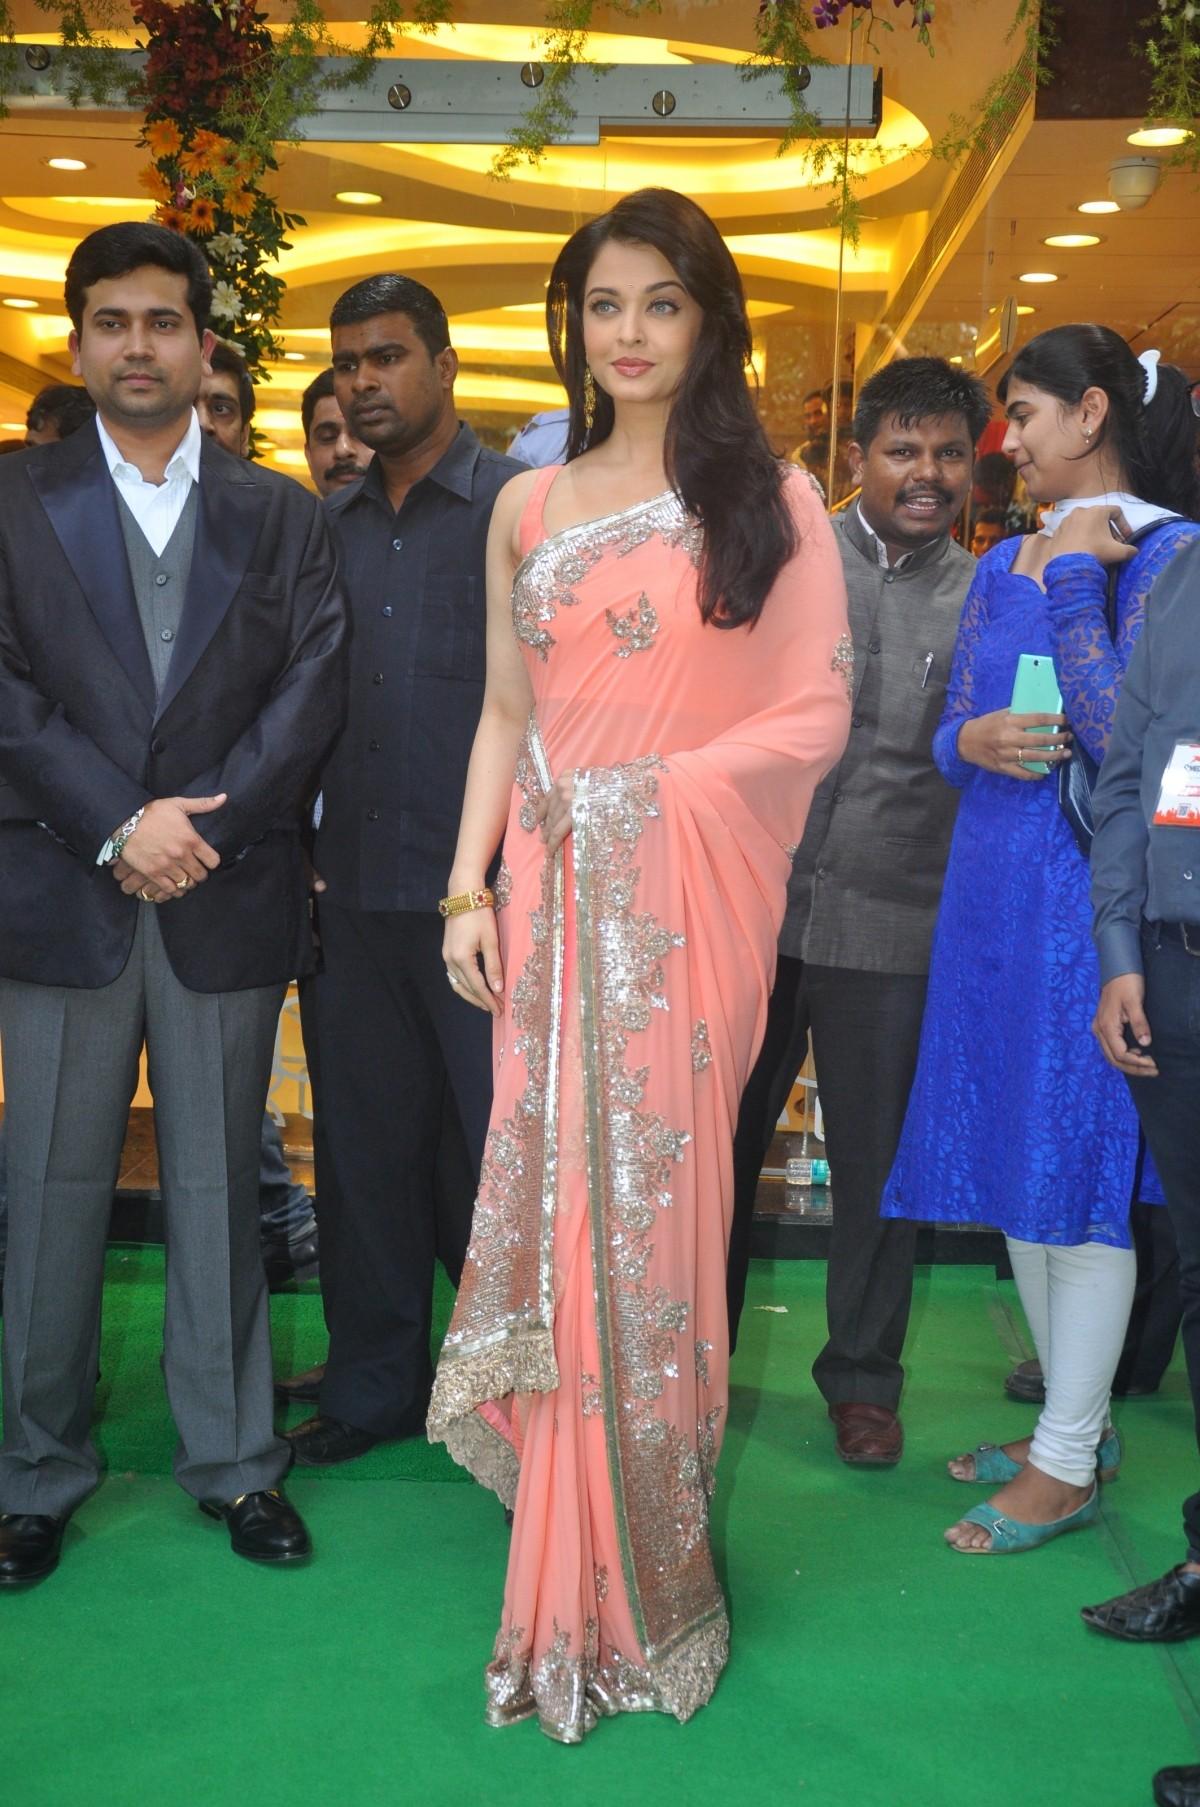 aishwarya rai bachchan inaugurates kalyan jewellers new store; looks